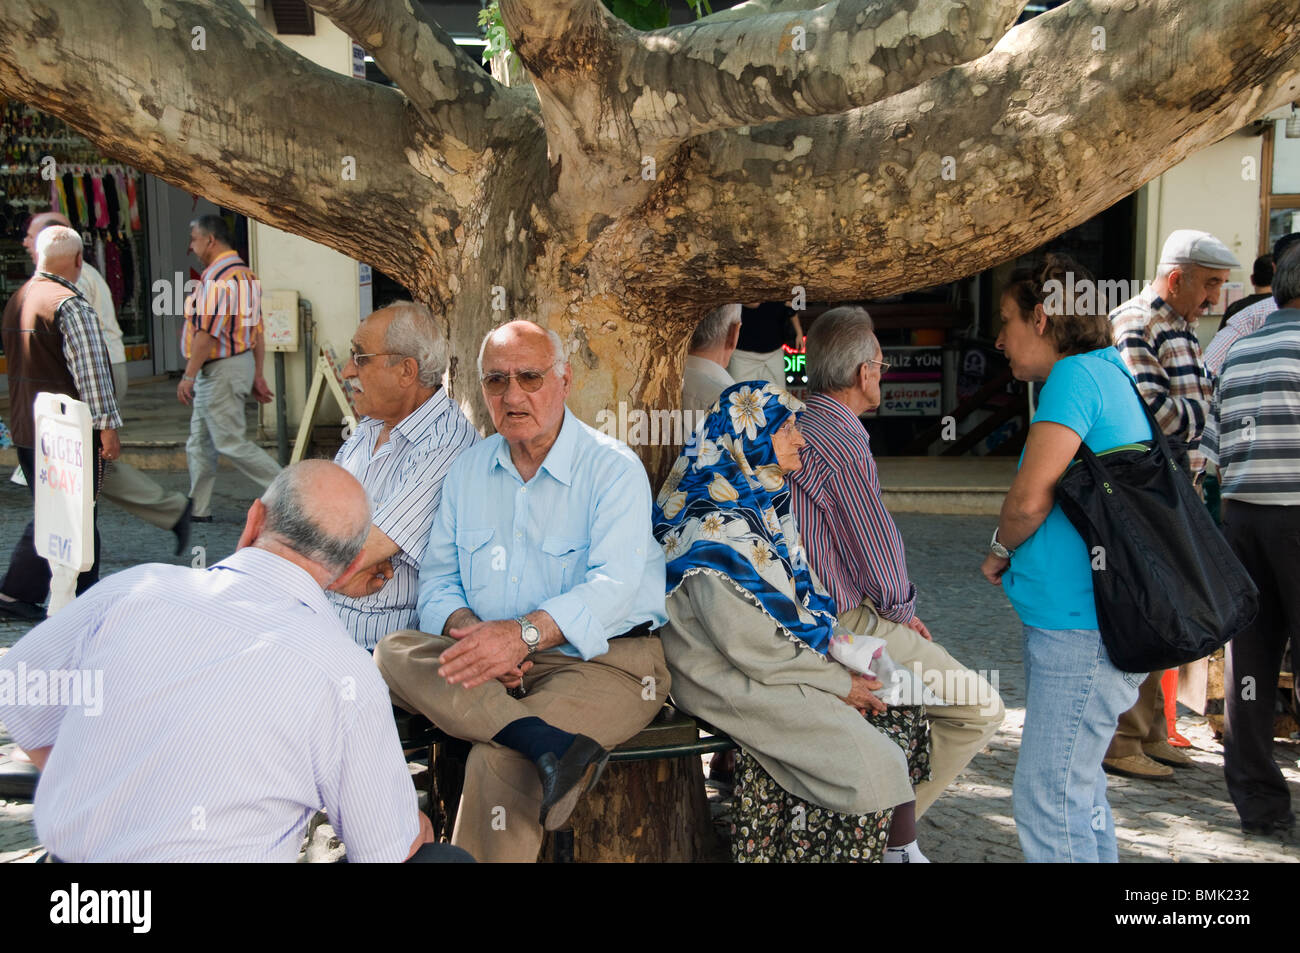 Bursa Kapali Carci Baz Basar Türkei Anatolien Greis Marktund Womanan ruht auf einem Baum Stockbild